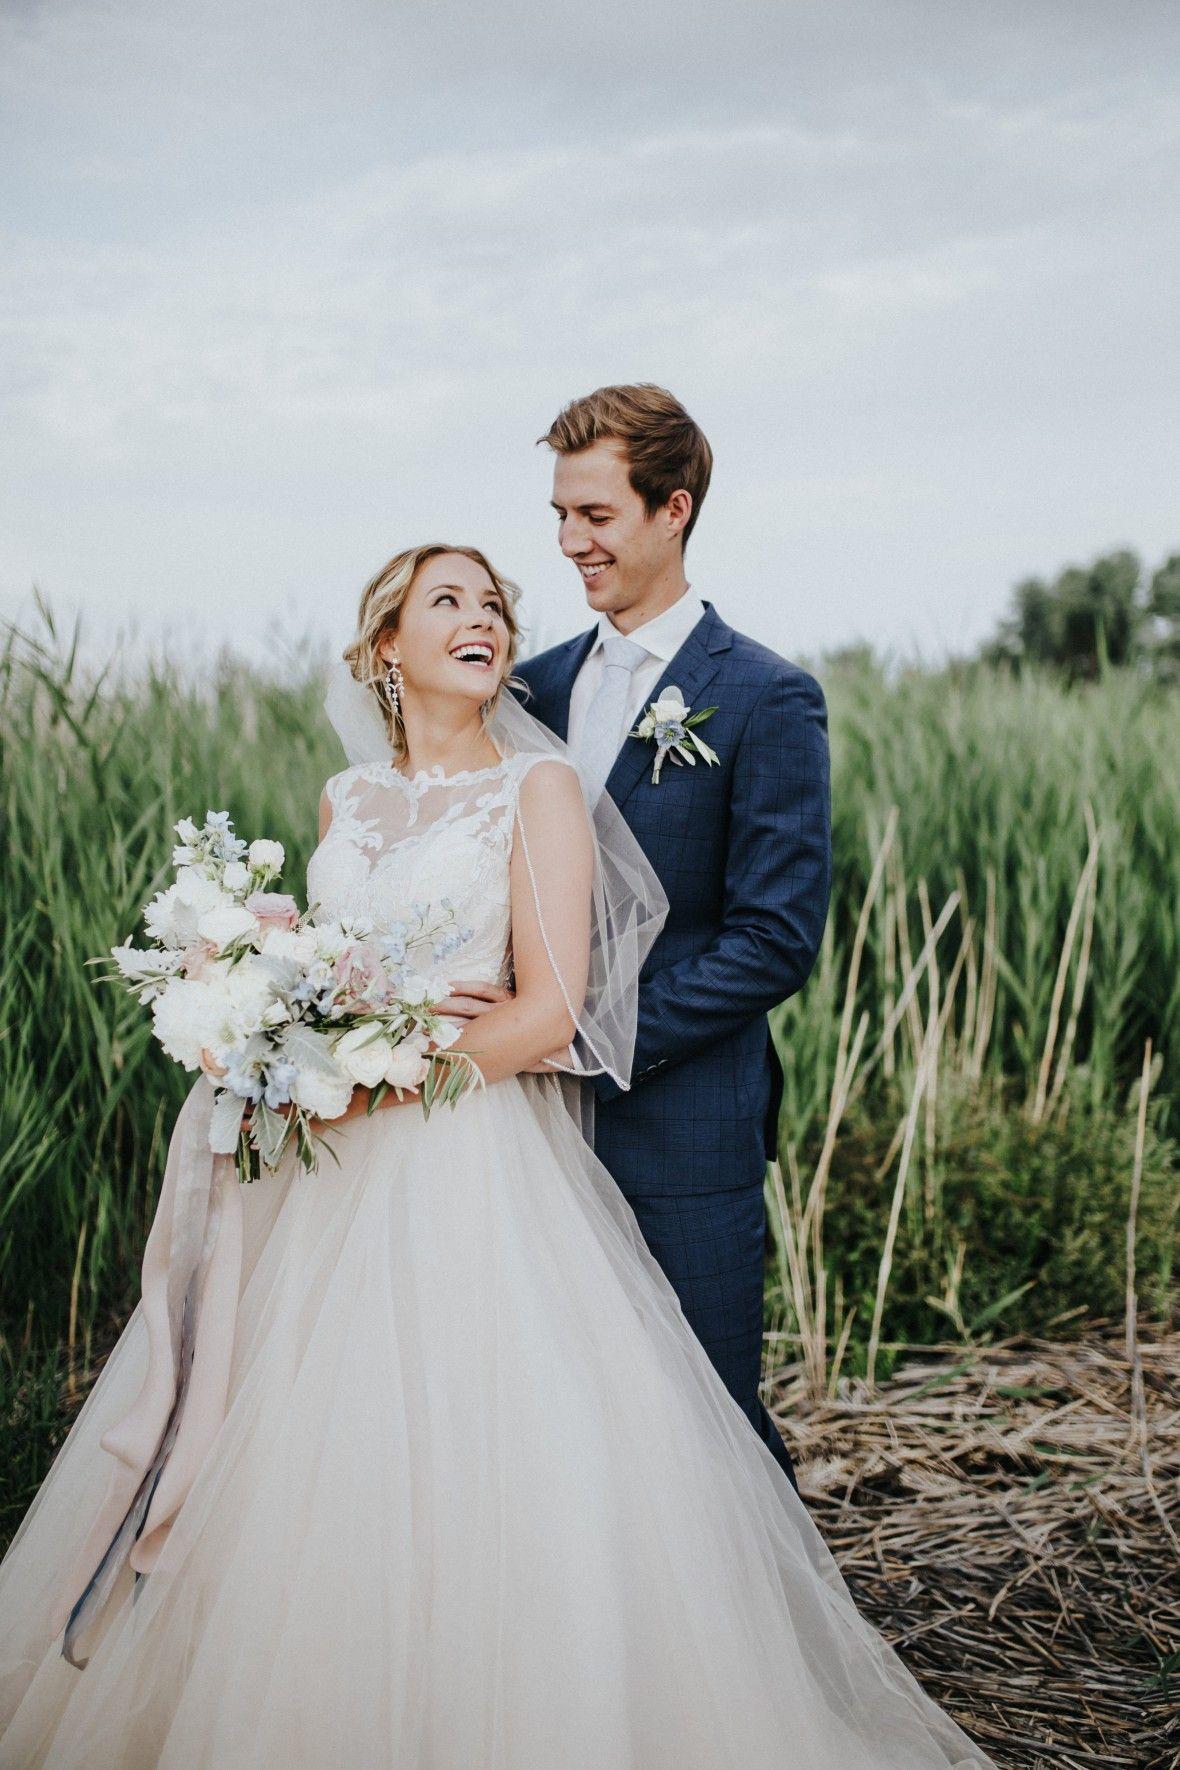 Introducing rebecca ingram elegant wedding dresses at affordable